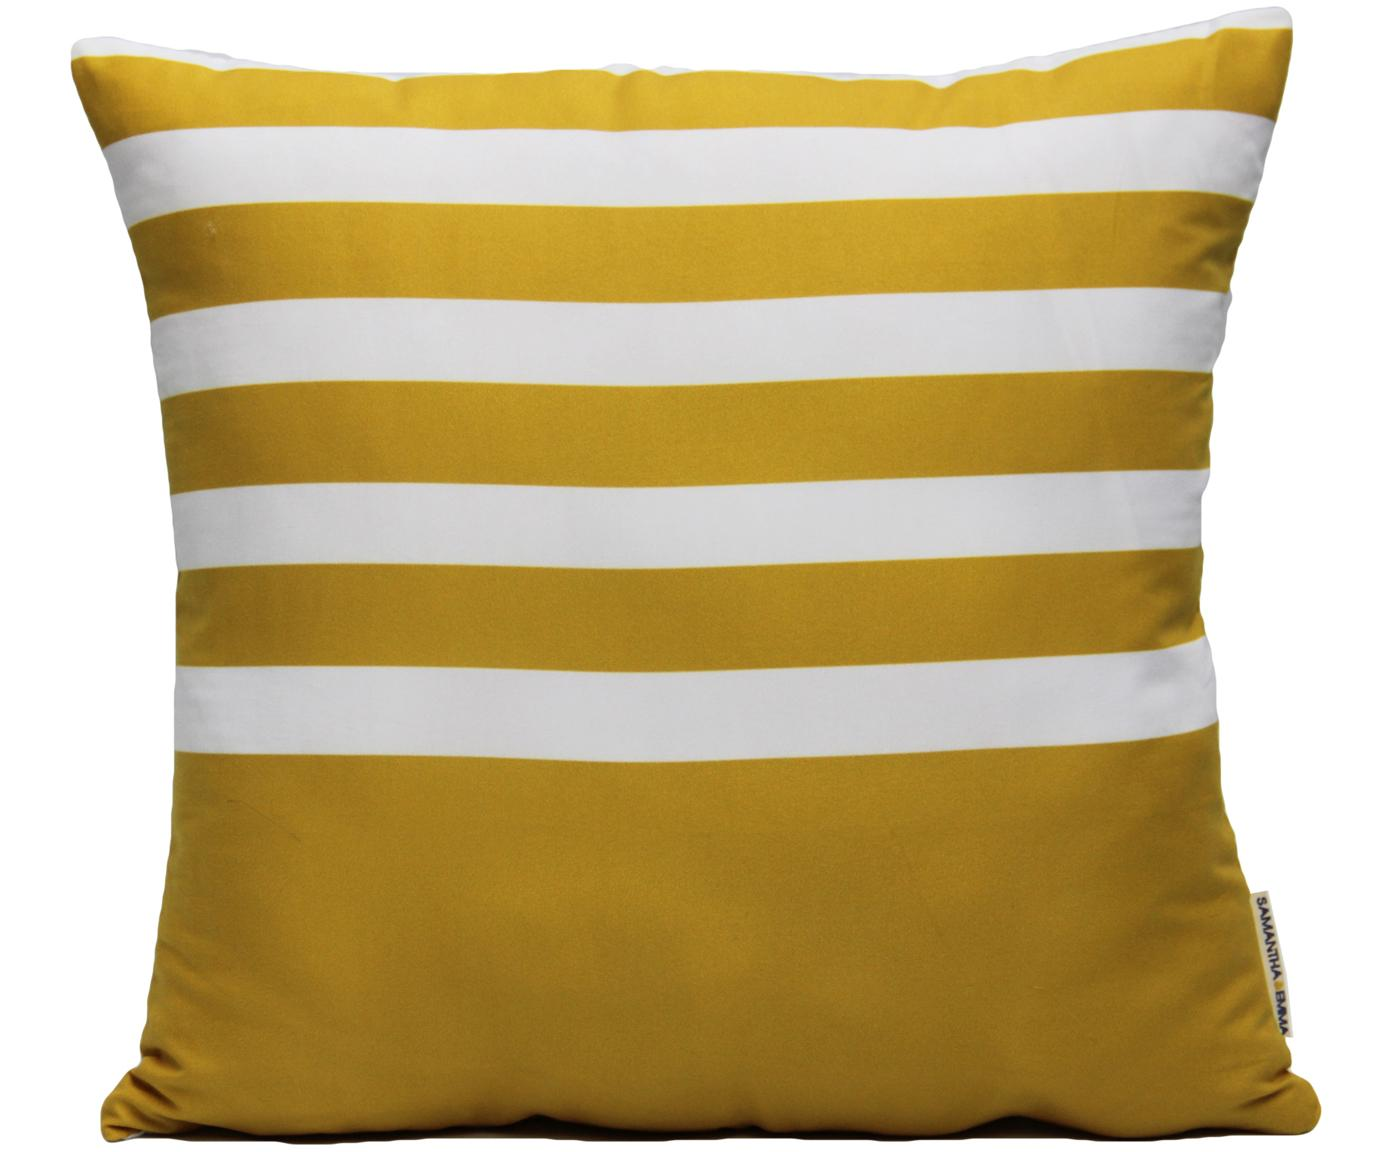 Kissenhülle Ela, 100% Polyester, Weiss, Gelb, 40 x 40 cm